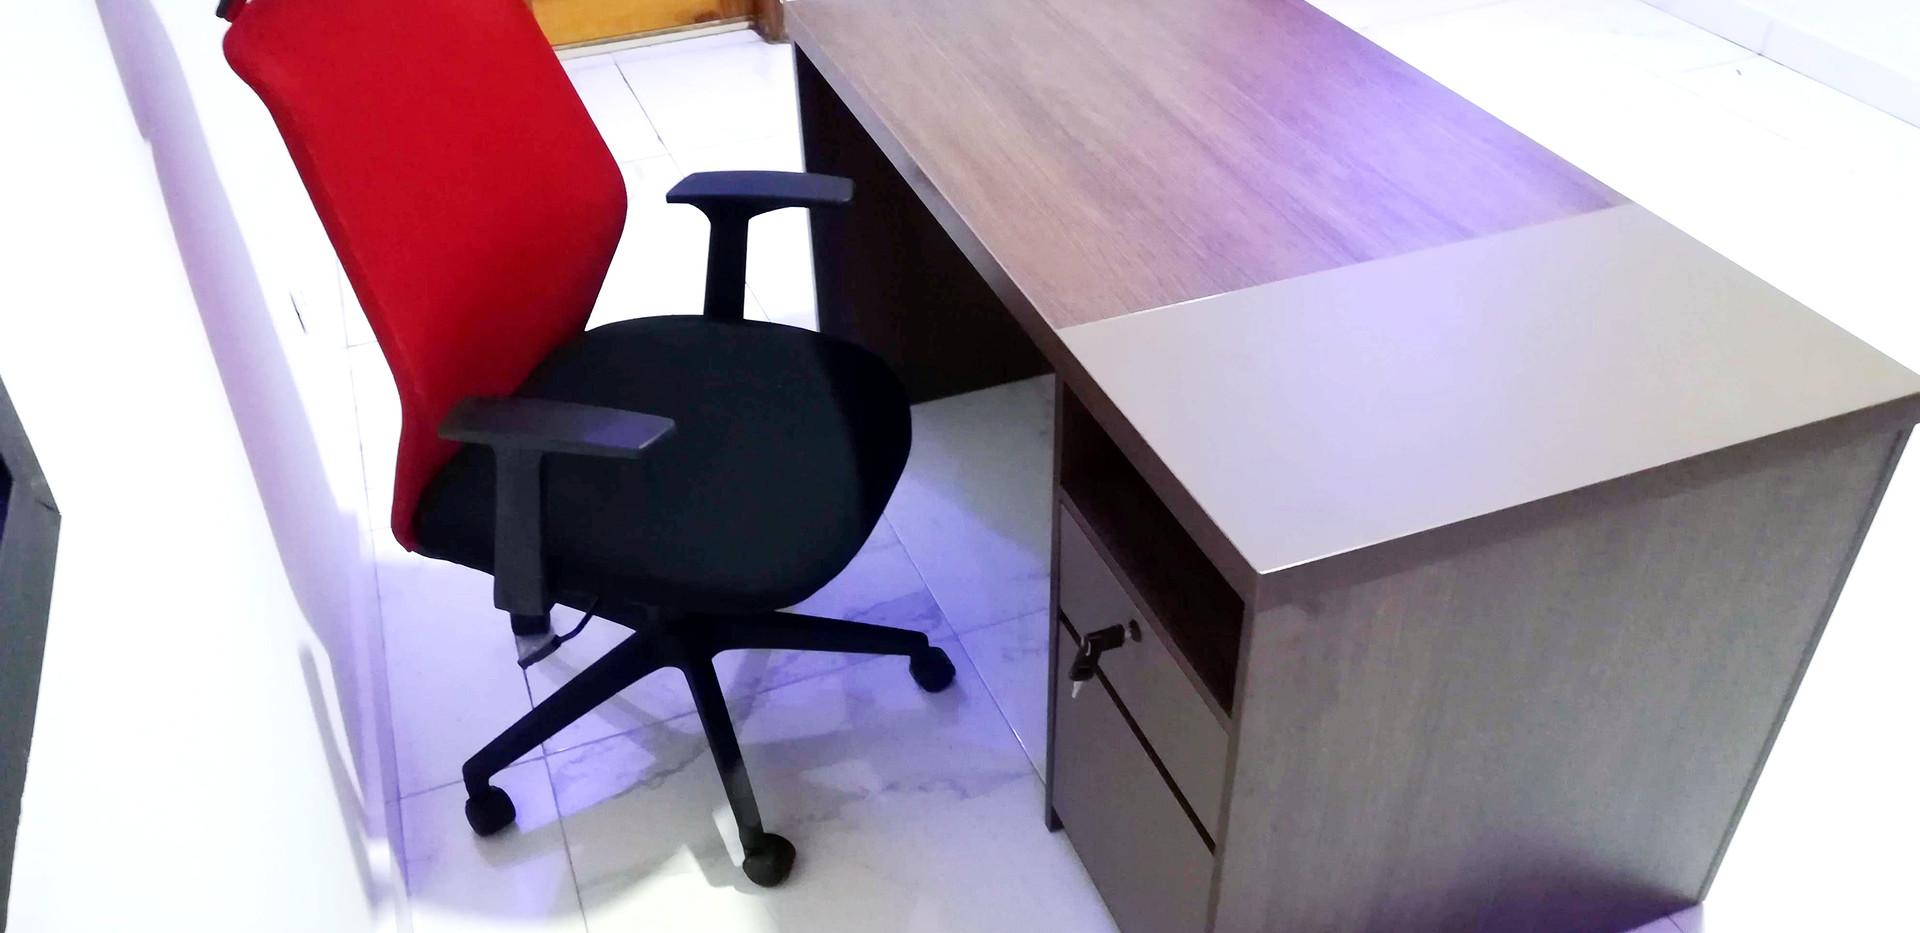 Siège ergonomique